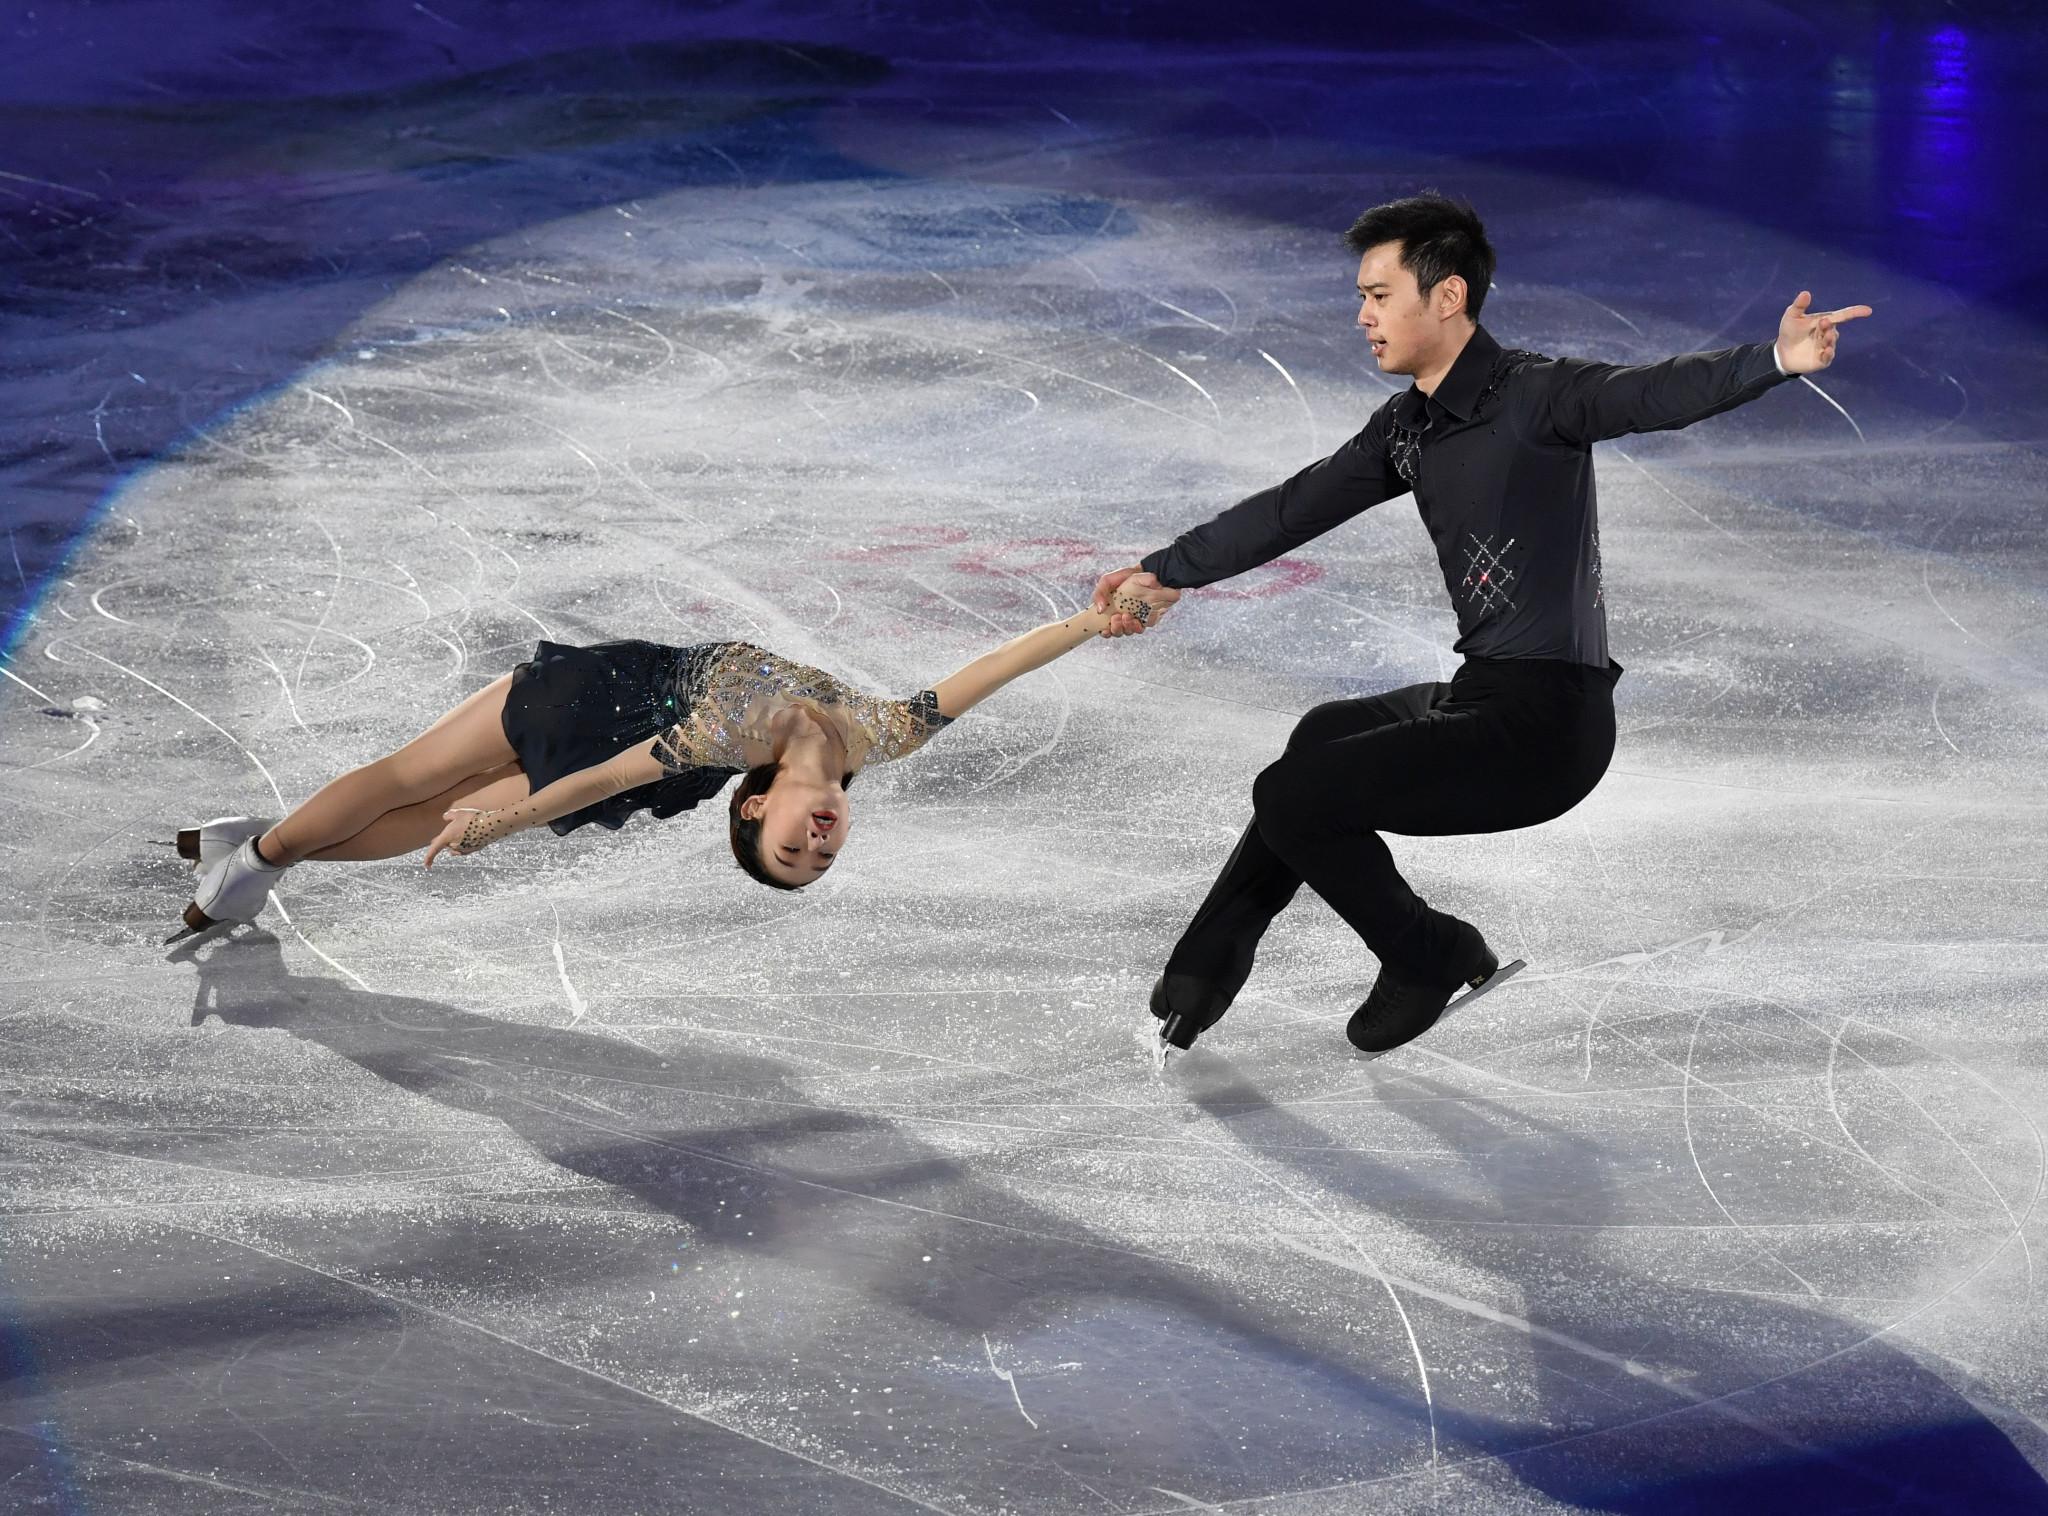 ISU cancels events including World Figure Skating Championships